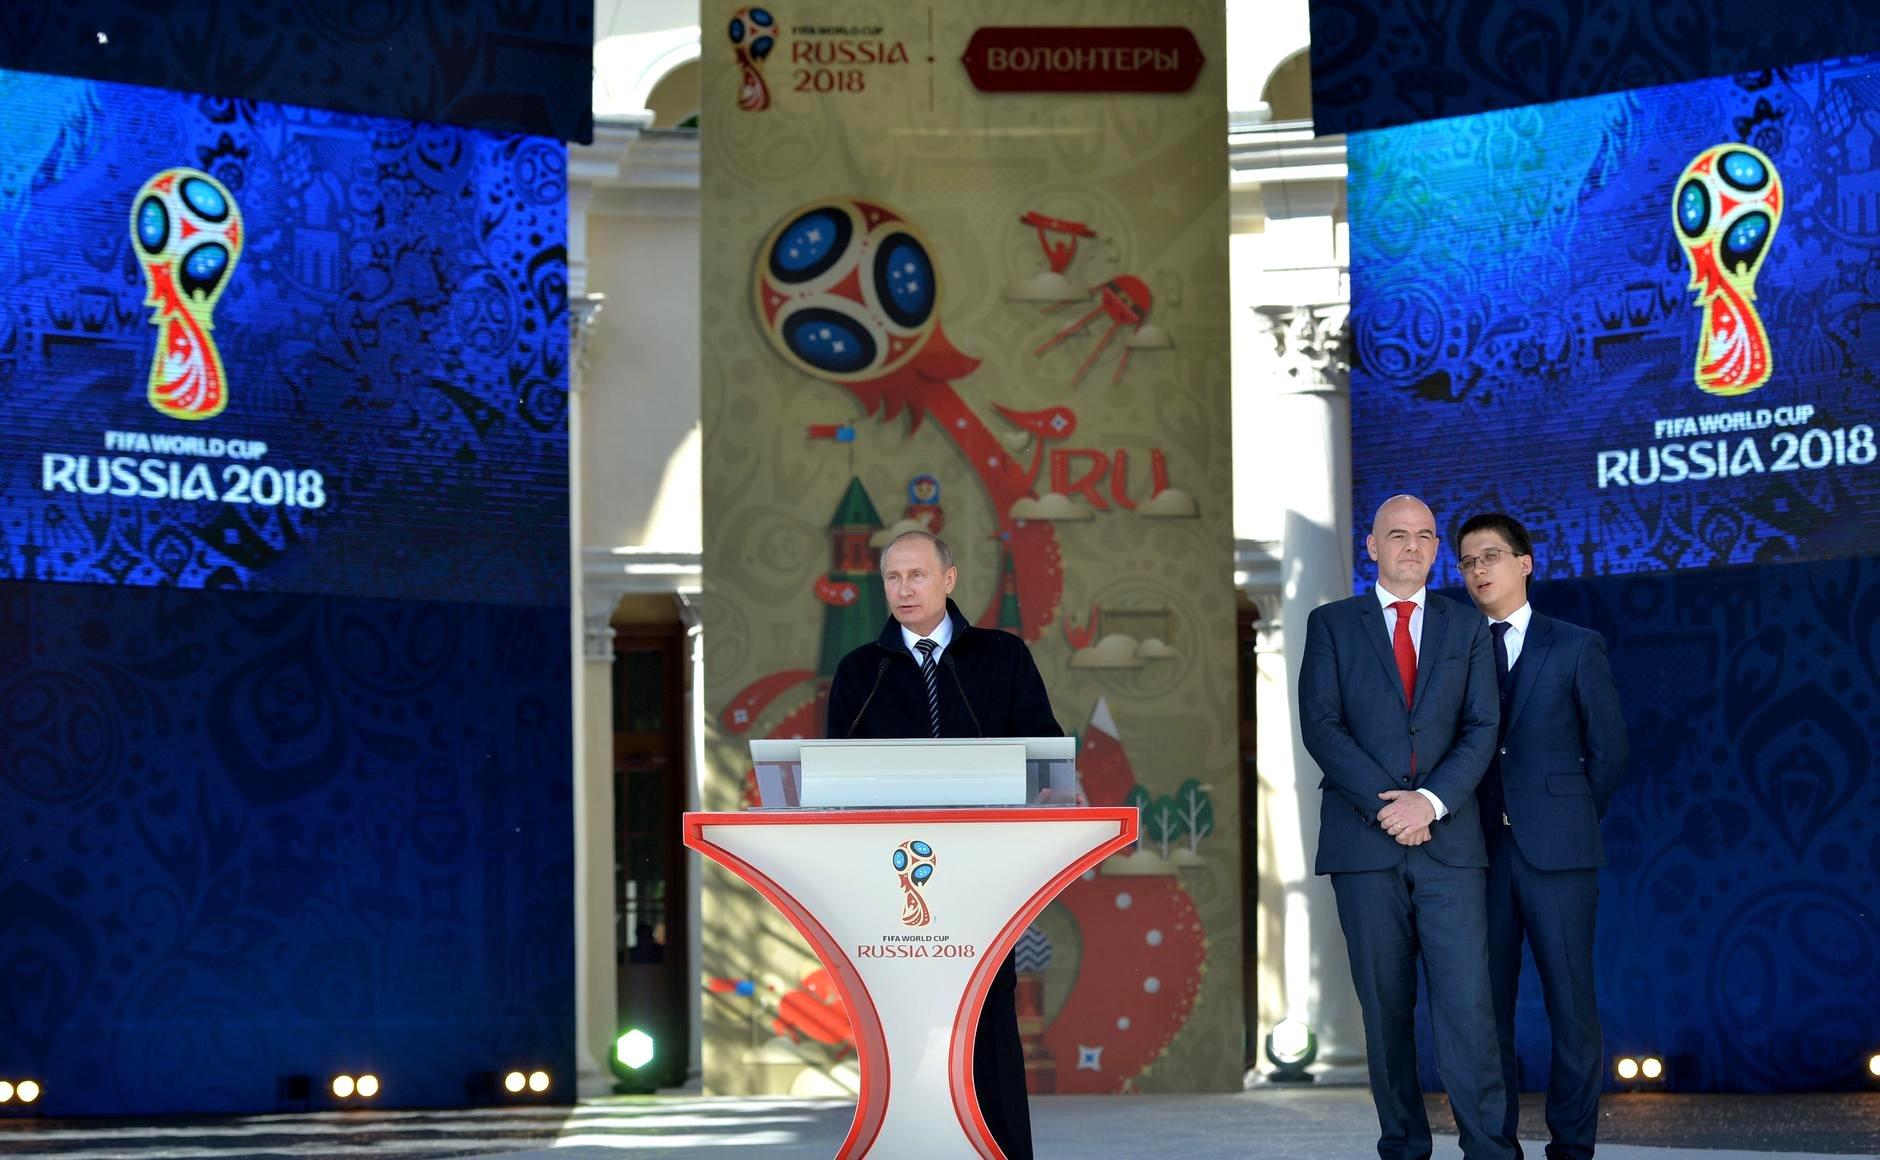 Program ini bertujuan untuk mempekerjakan sekitar 5.500 relawan selama pelaksanaan Piala Konfederasi FIFA pada tahun 2017 dan 15 ribu relawan yang akan ambil bagian dalam mengurus pernah cup piala dunia sepak bola yang pertama kali diselenggarakan di Rusia.